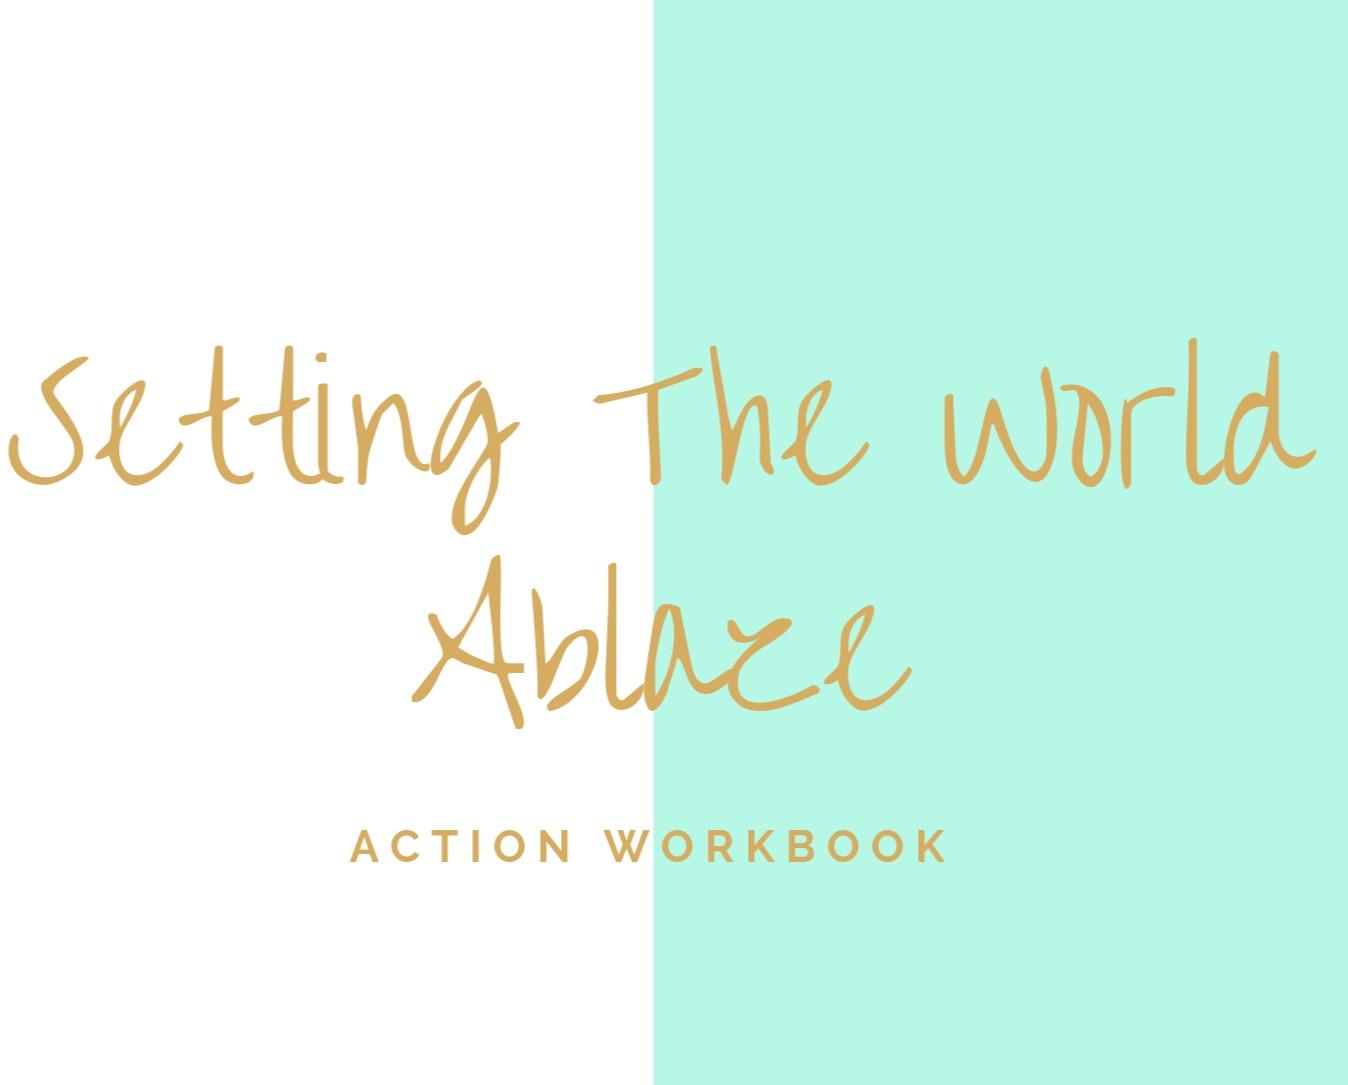 Setting+The+World+ablaze+website+graphic.jpg